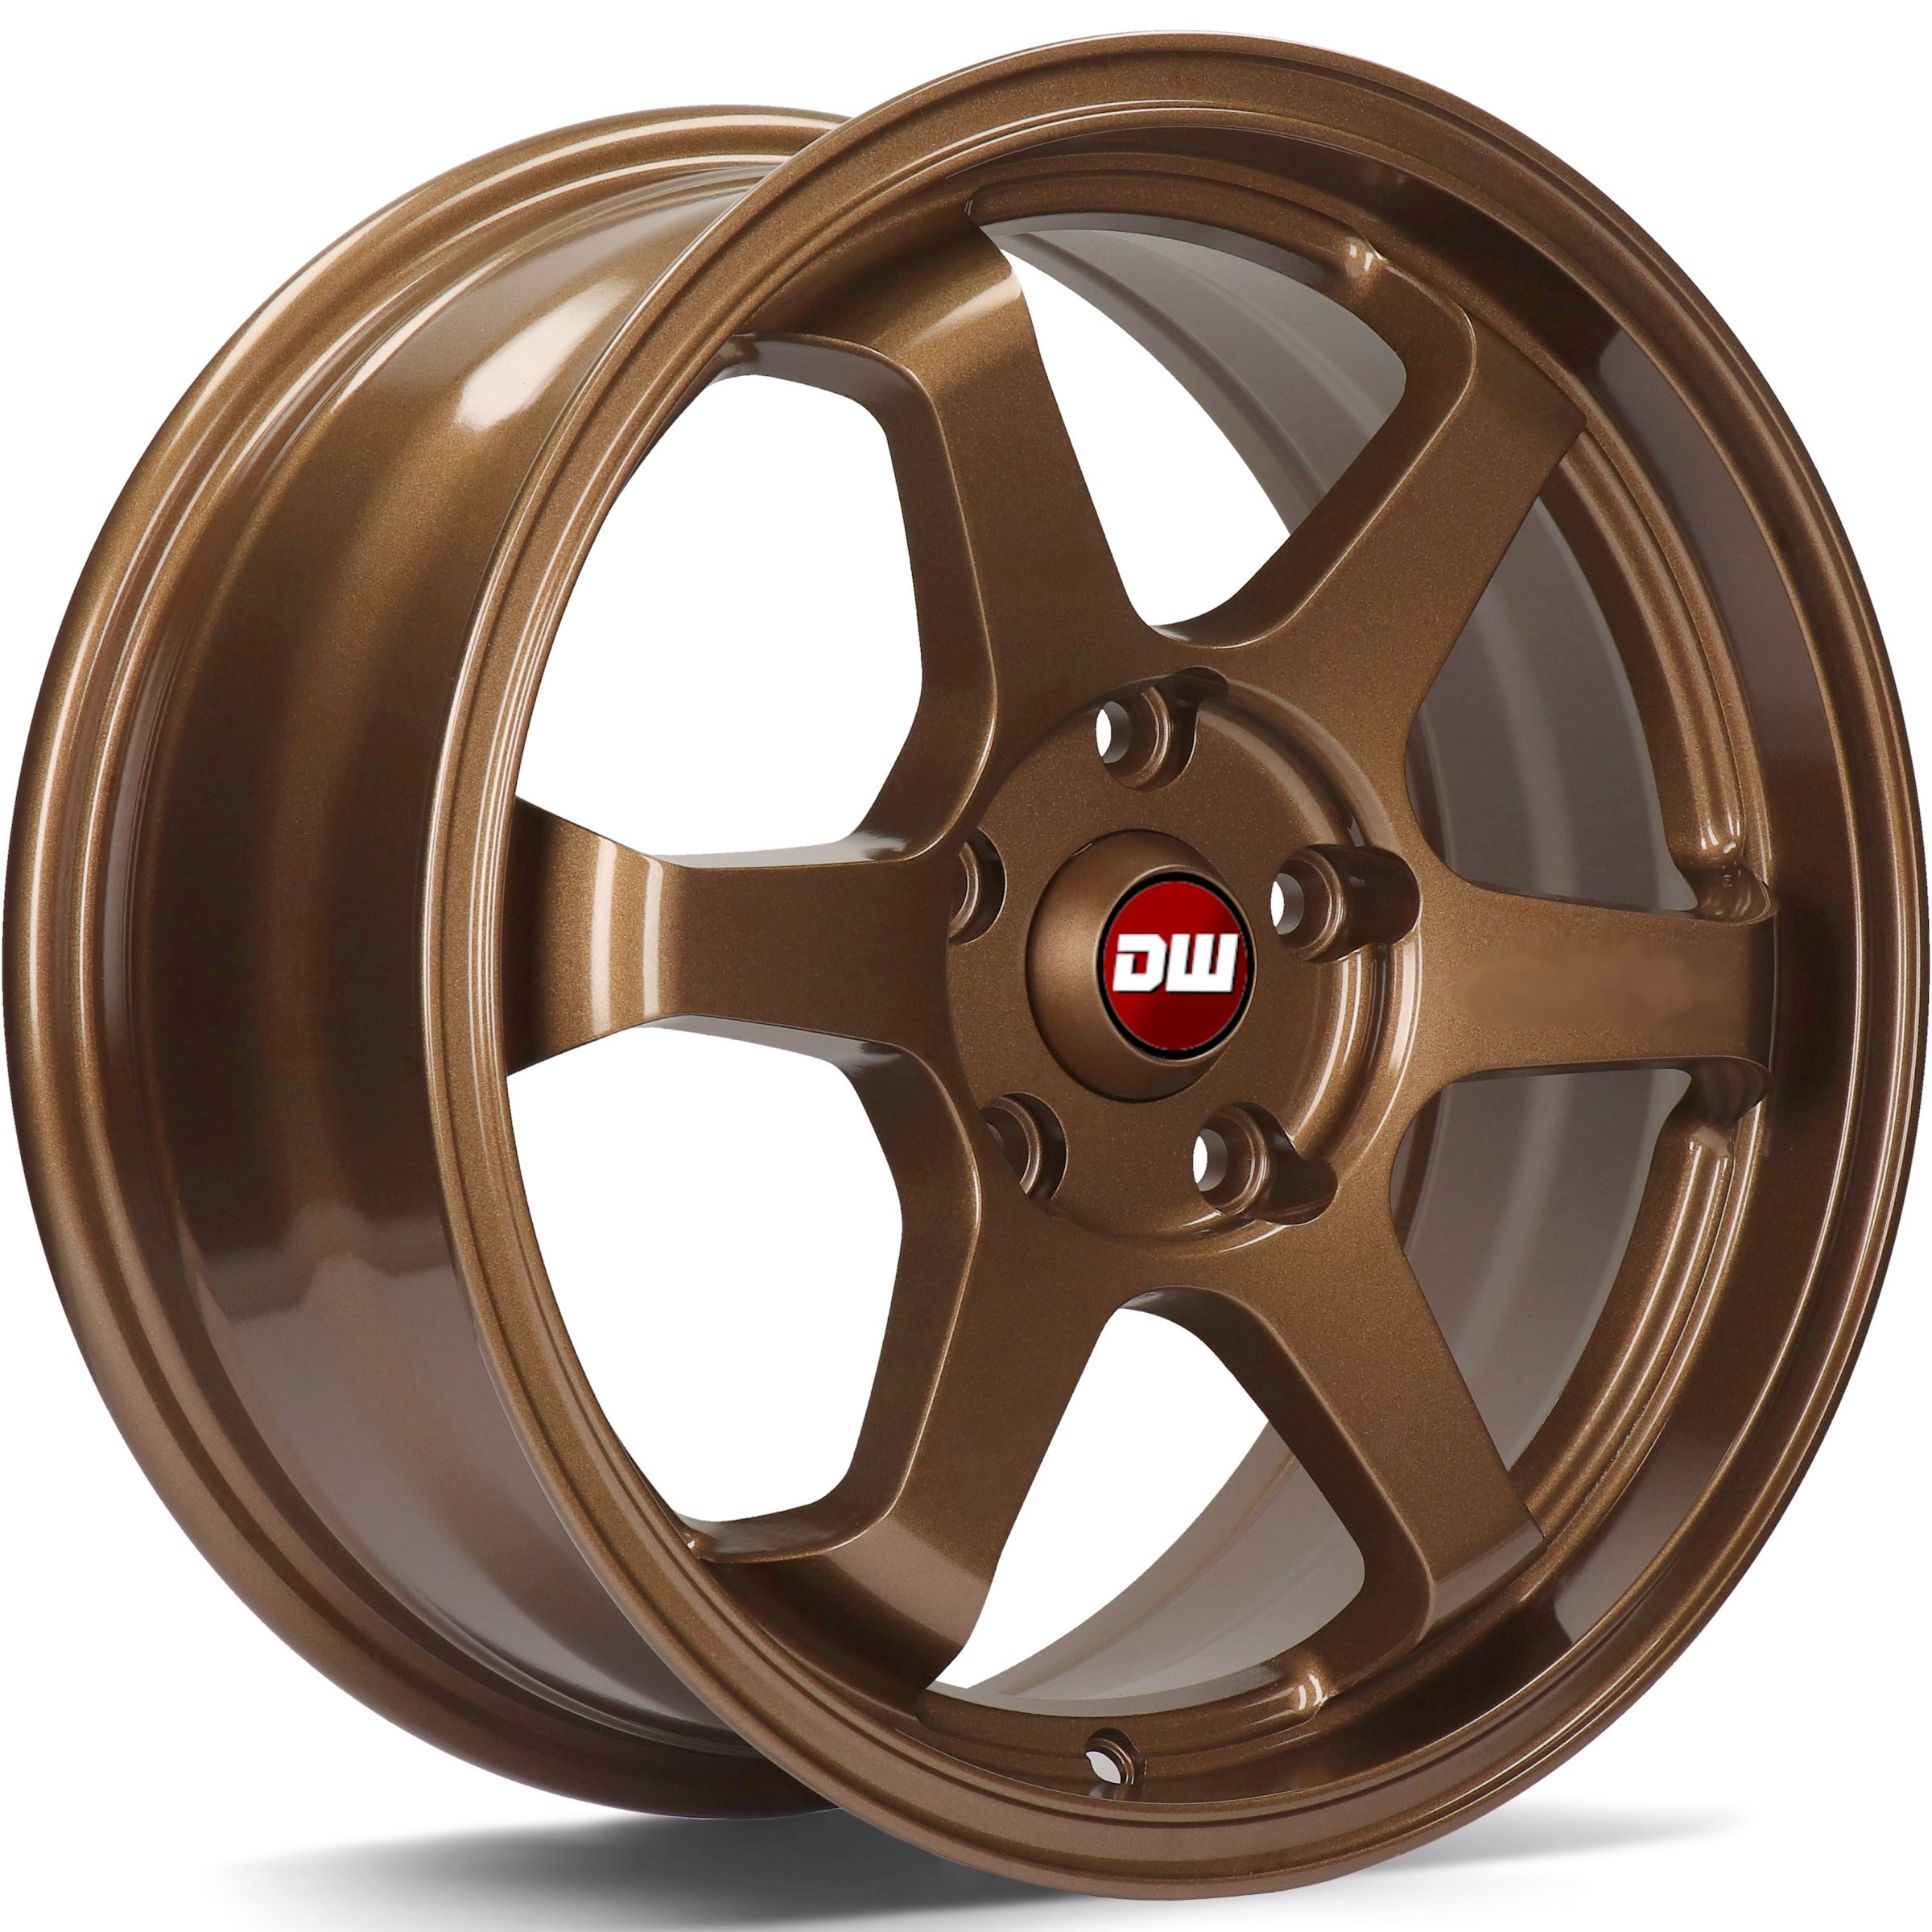 DW Wheels DWV-J Bronze